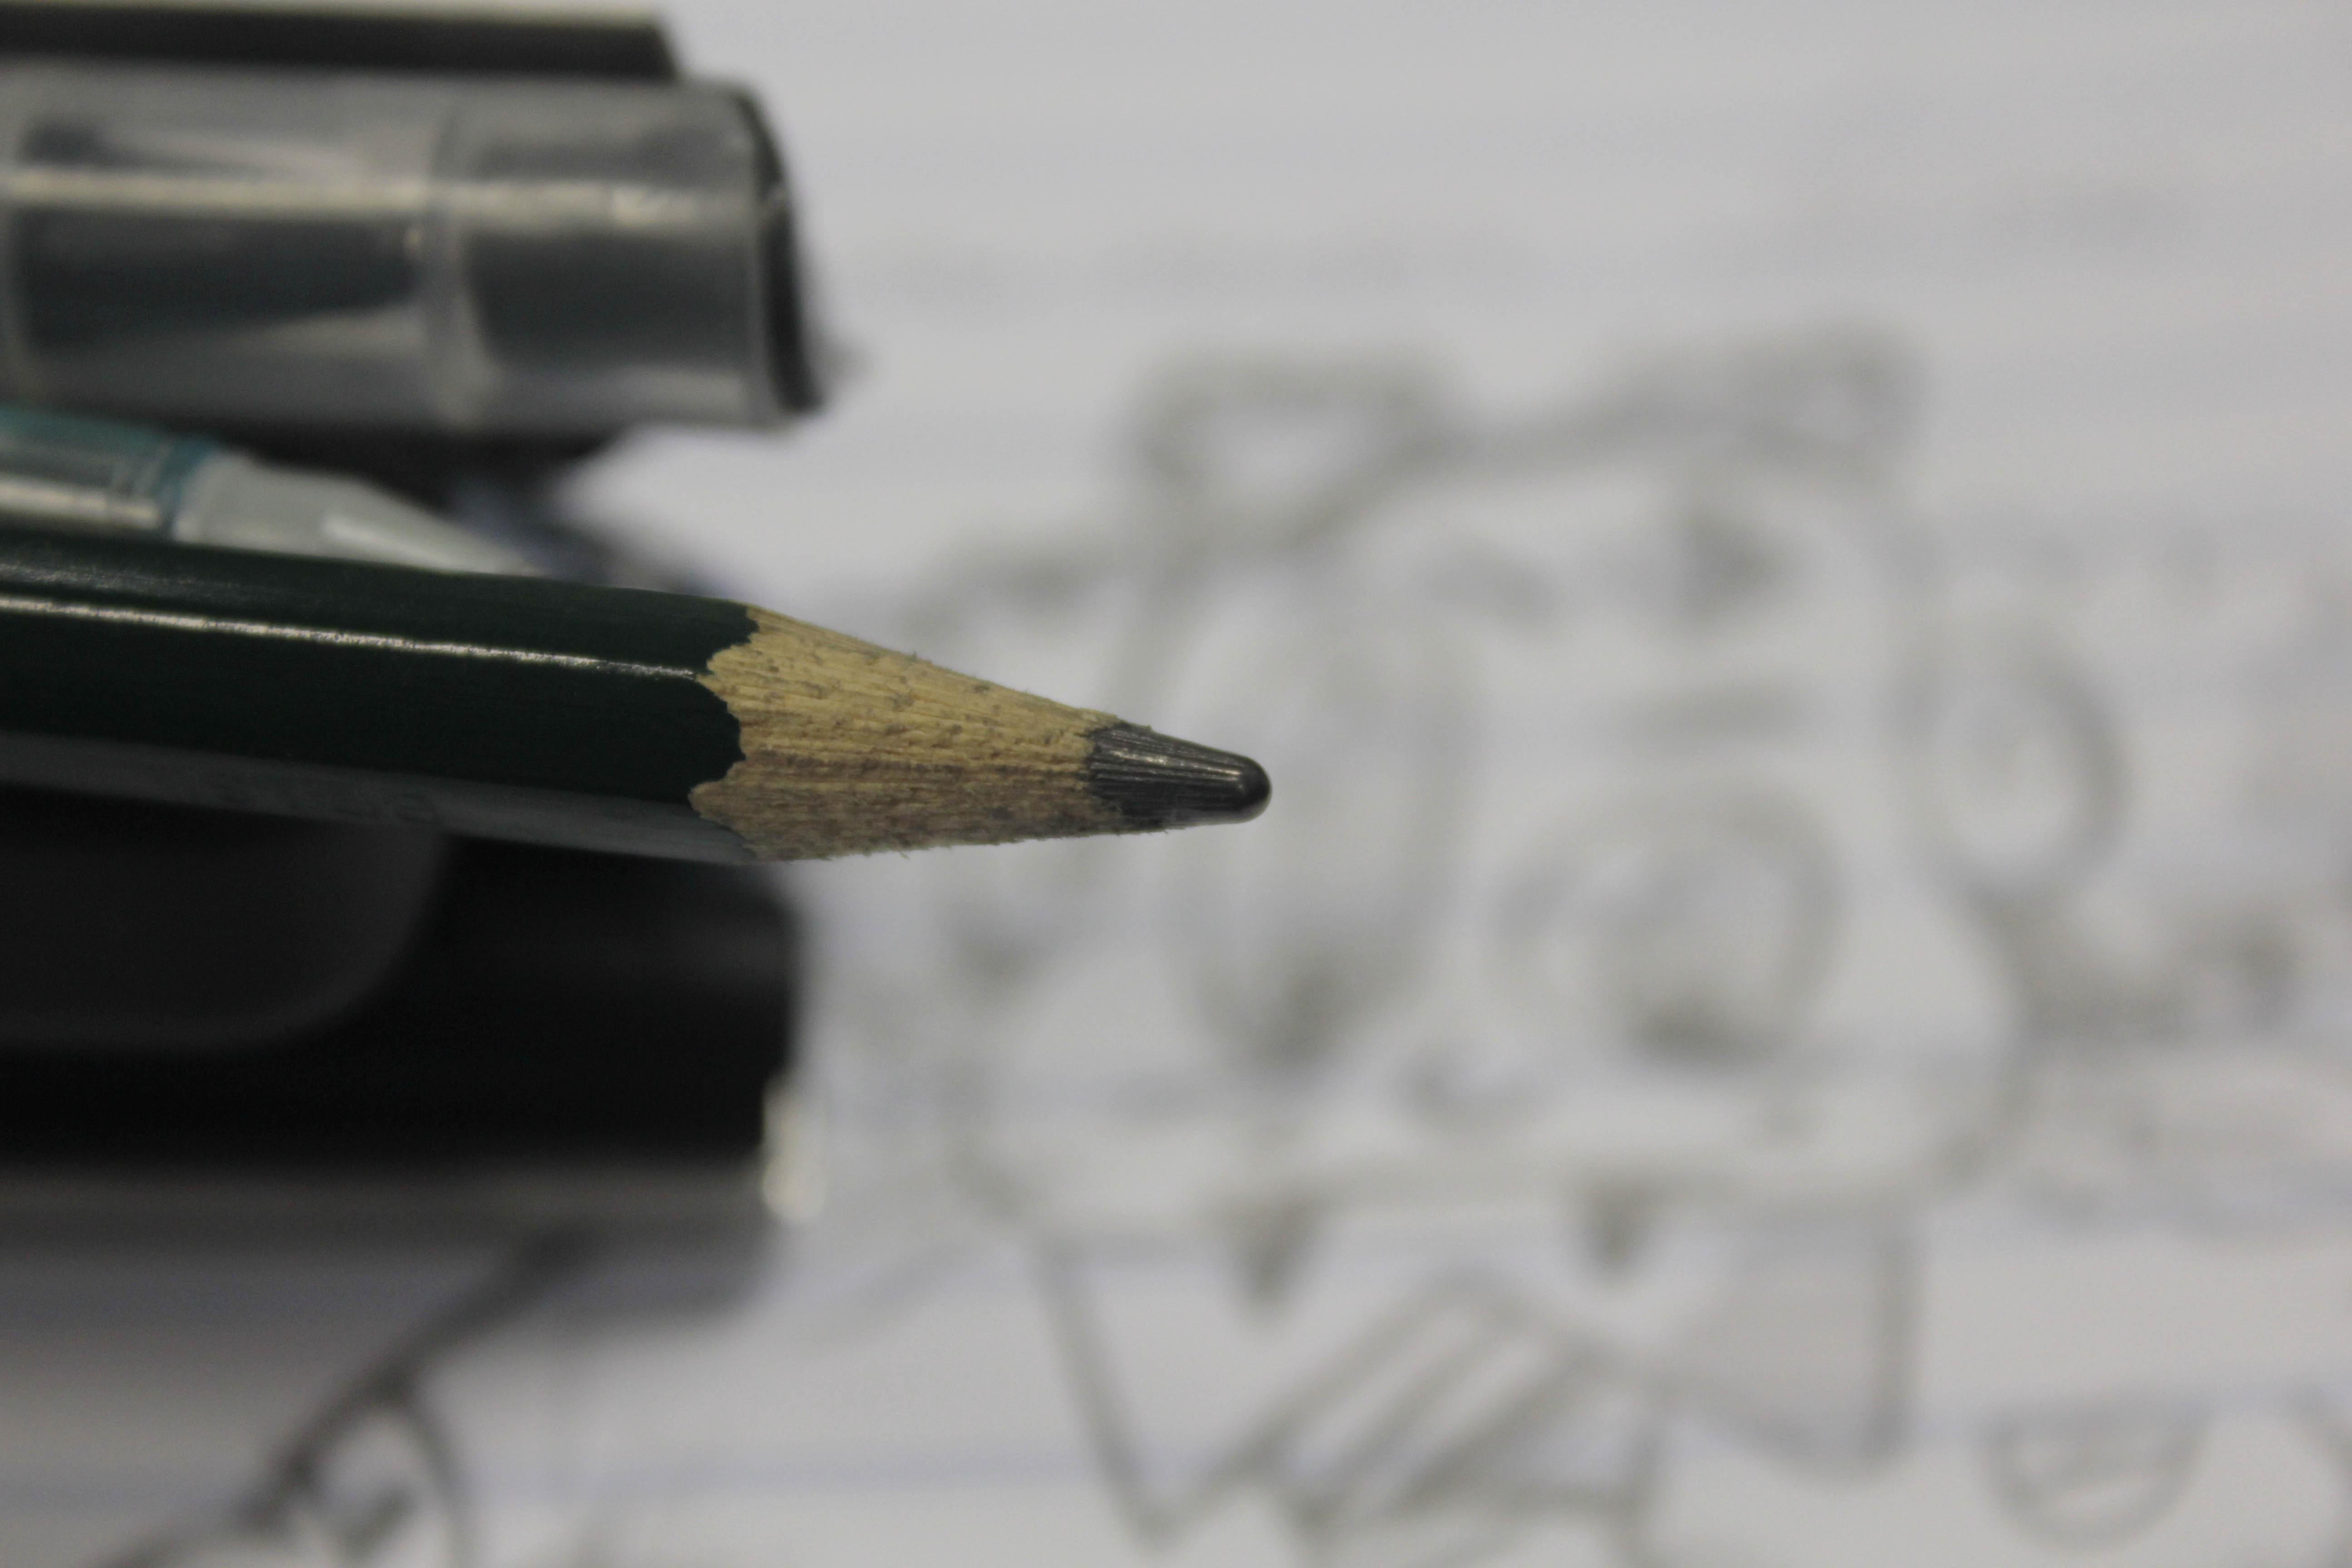 Fotos Gratis Escritura Mano Lápiz Bolígrafo Dibujo Gafas